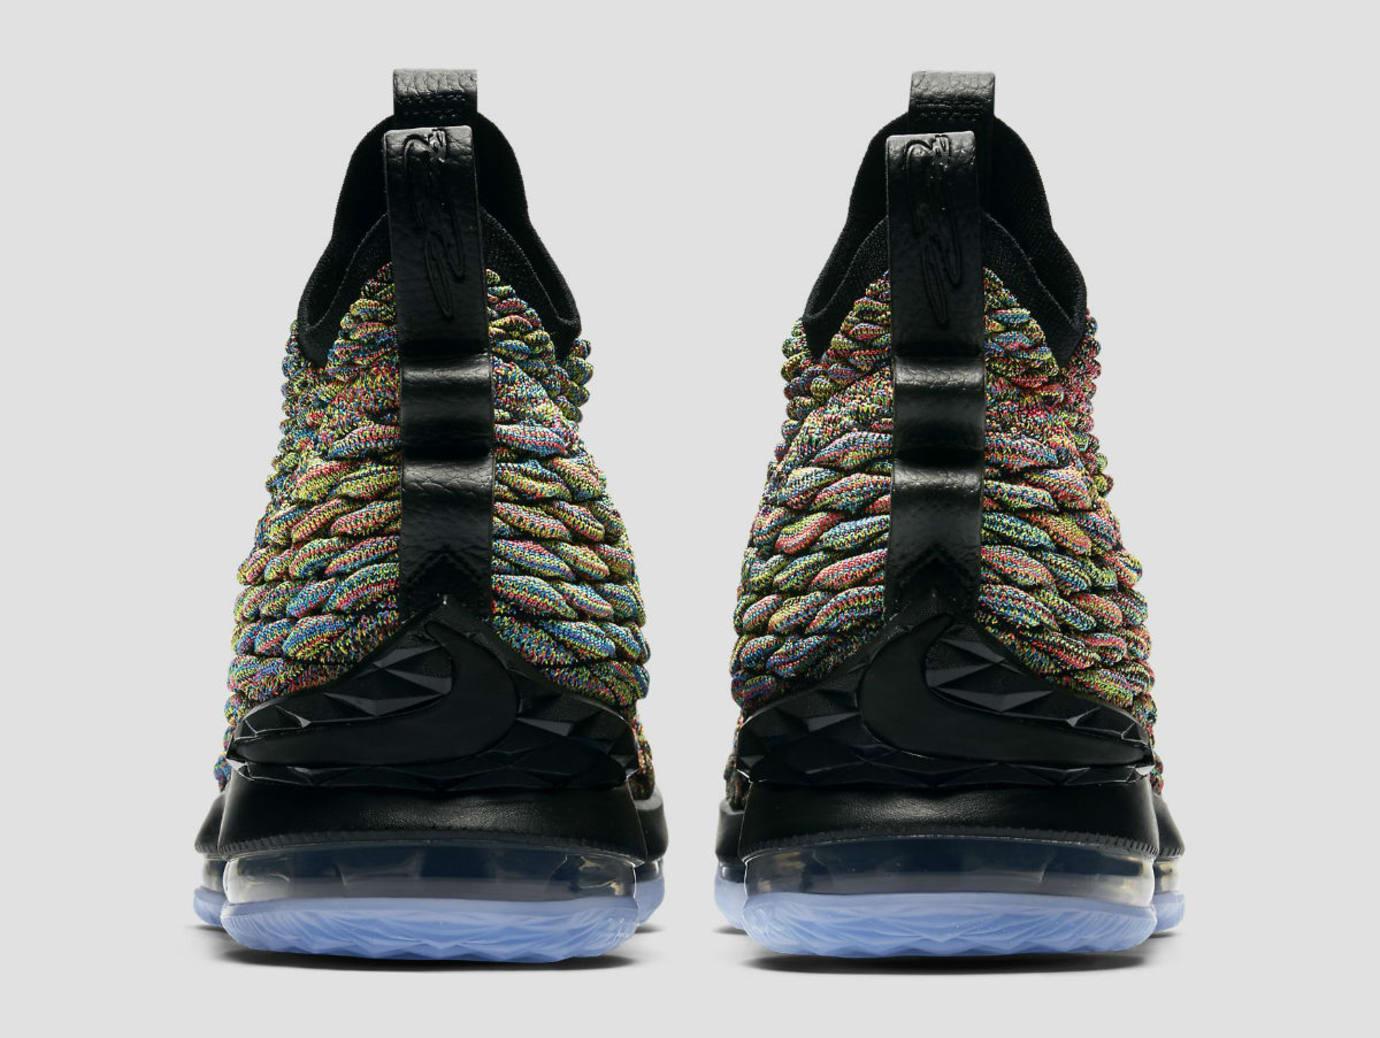 ab1a1f0ca035bf Nike LeBron 15 XV Four Horsemen Black Fruity Pebbles Release Date 897648-901  Heel